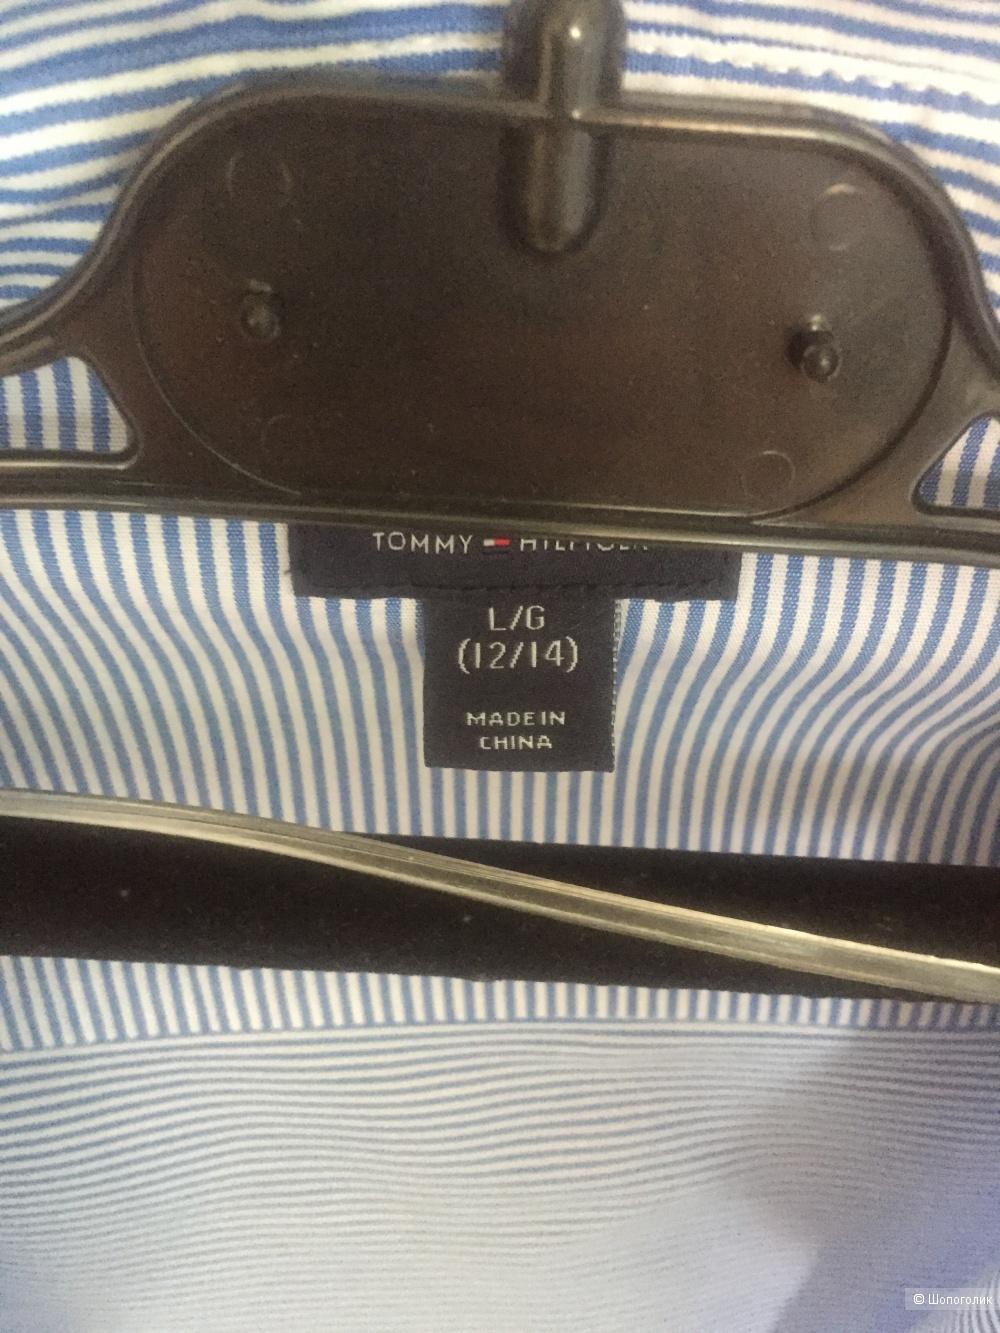 Рубашка ф. Tommy Hilfiger 12/14 (L/G)